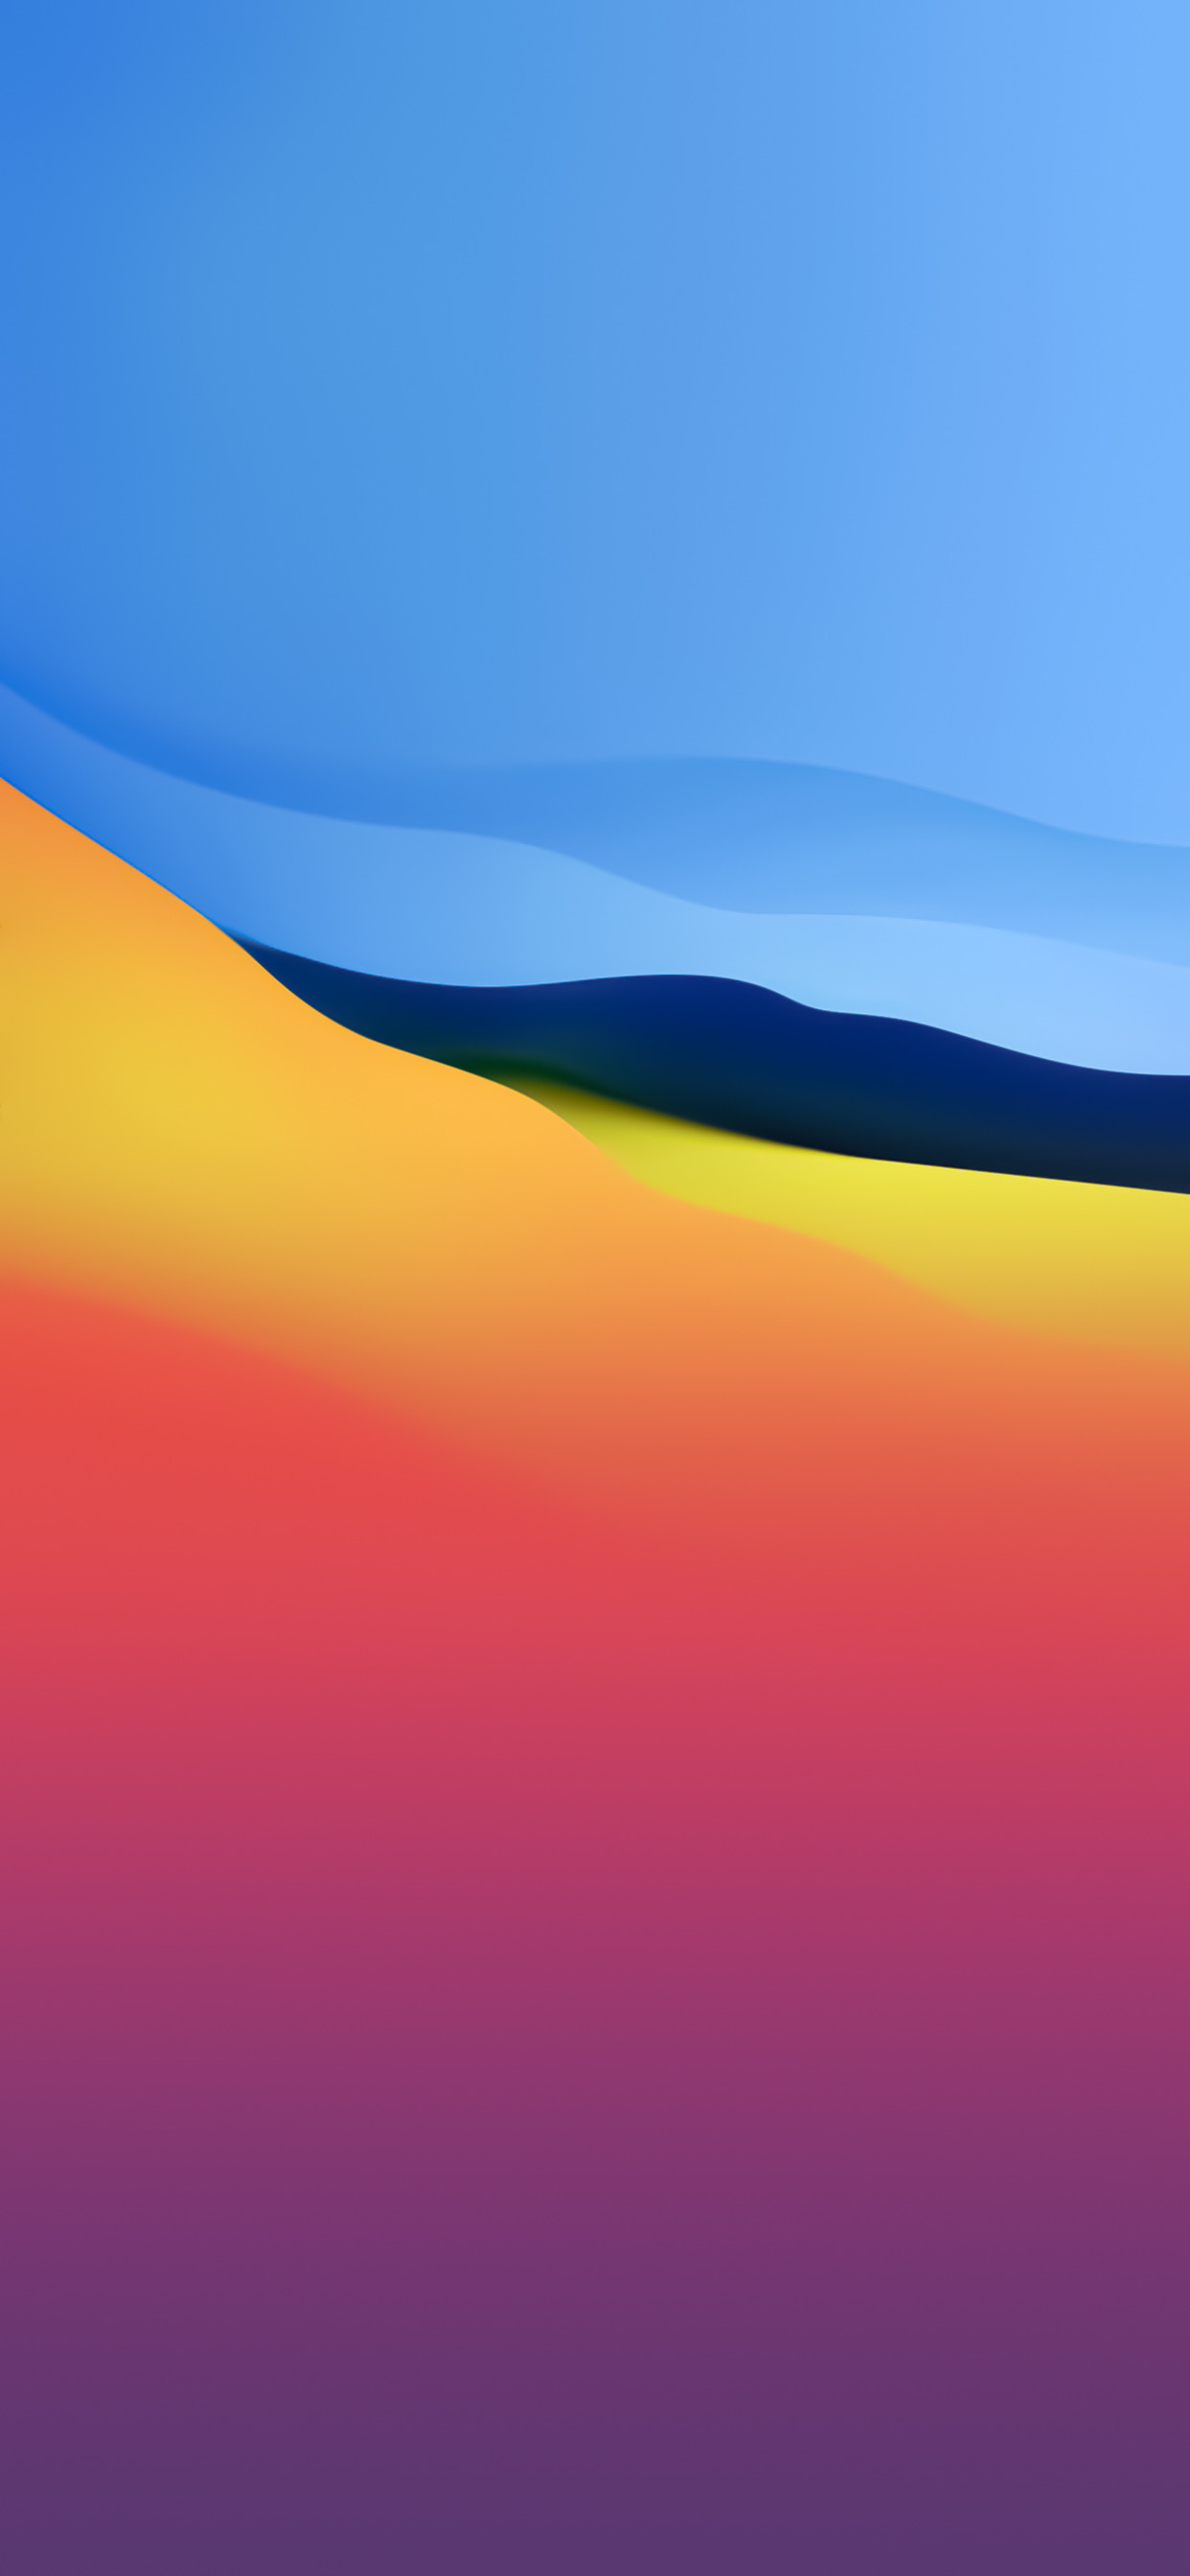 https://media.idownloadblog.com/wp-content/uploads/2021/06/iOS15-Concept-wallpaper-idownloadblog-AR72014-based-on-macOS-Big-Sur.jpg